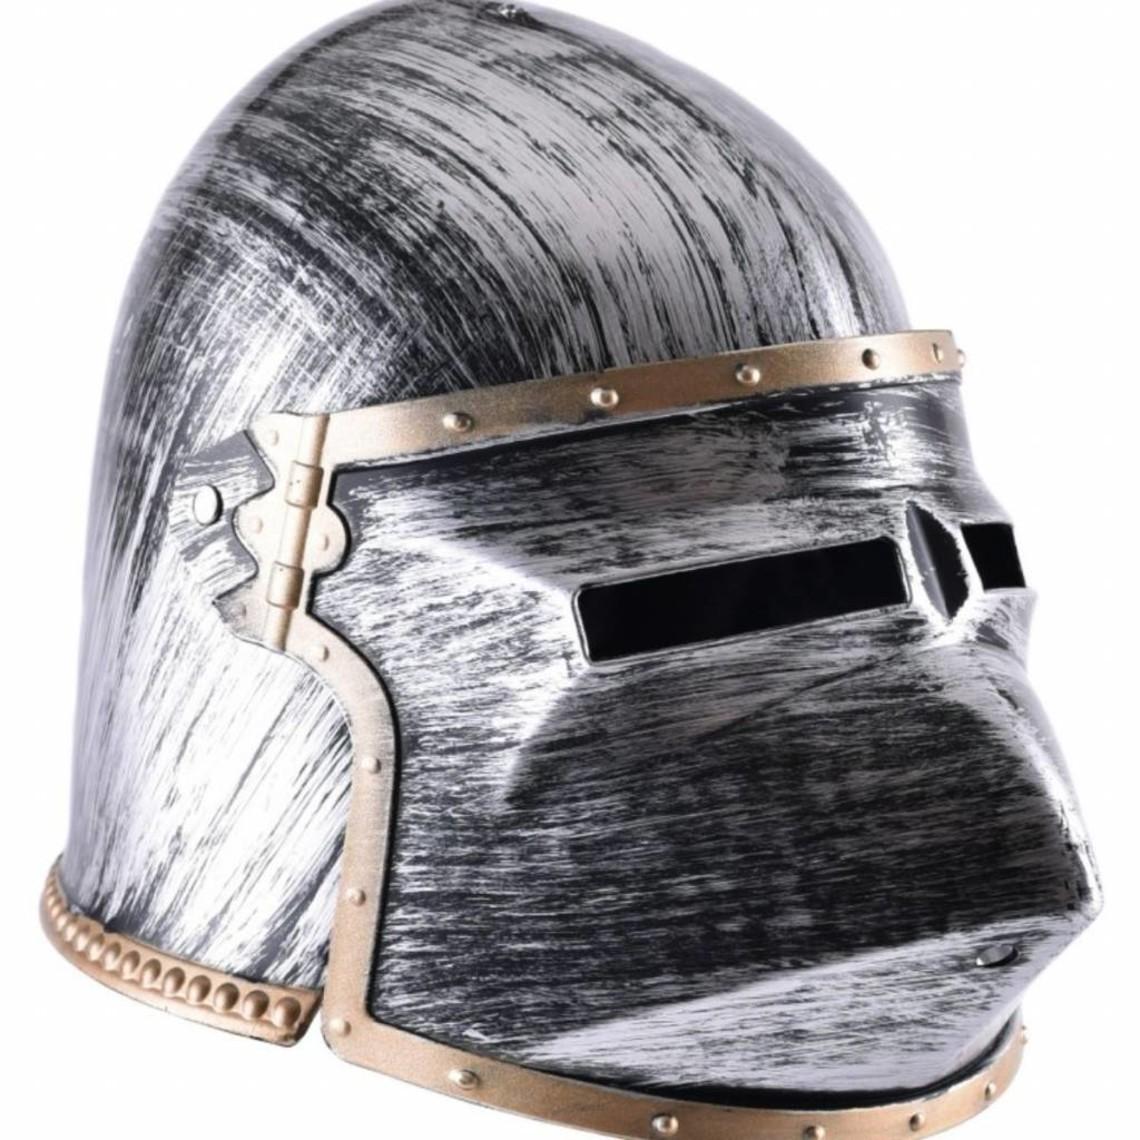 Toy Helm klappvisor Bascinet